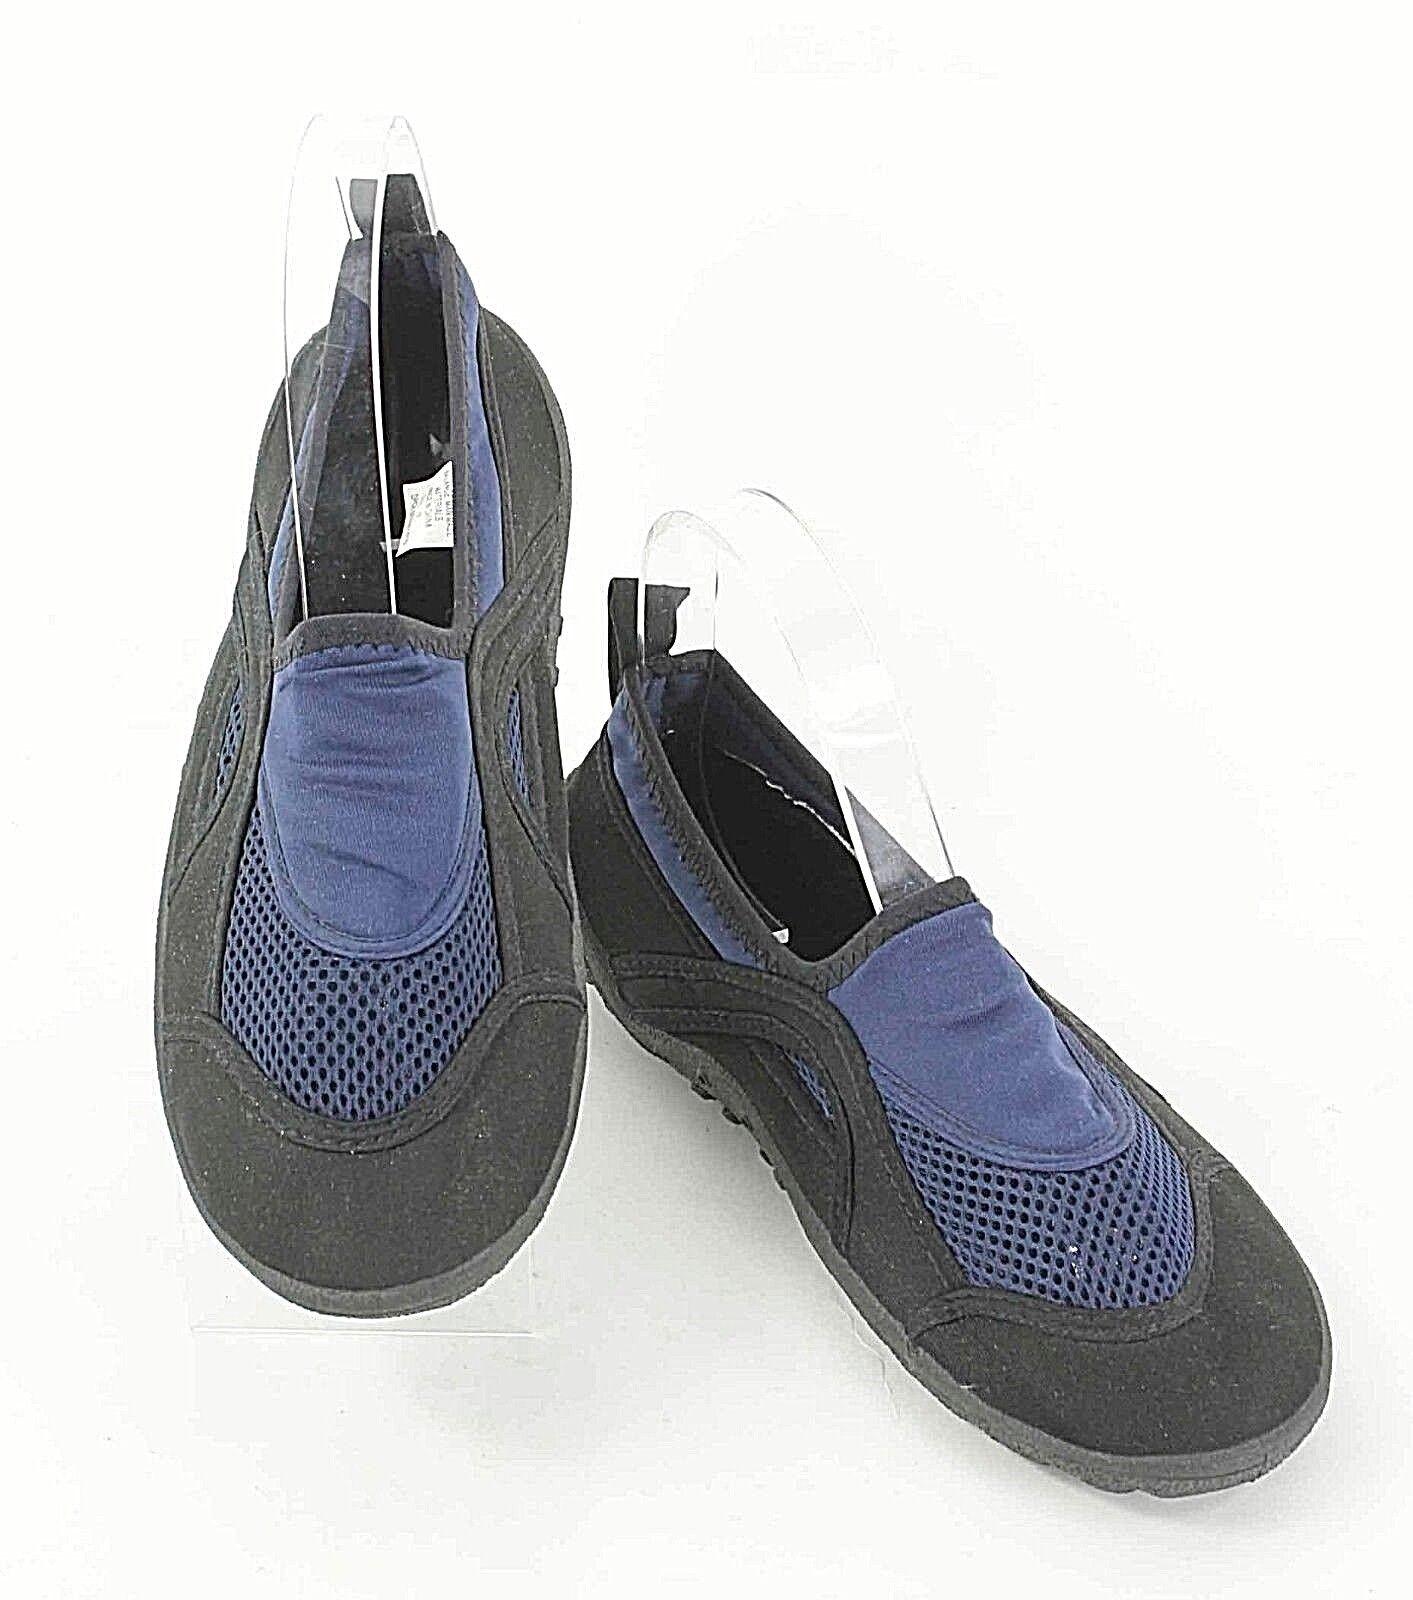 Aqua Fabric Water Sz 7 Black Blue Fabric Aqua Upper Slip-On Shoes E262 5b4582